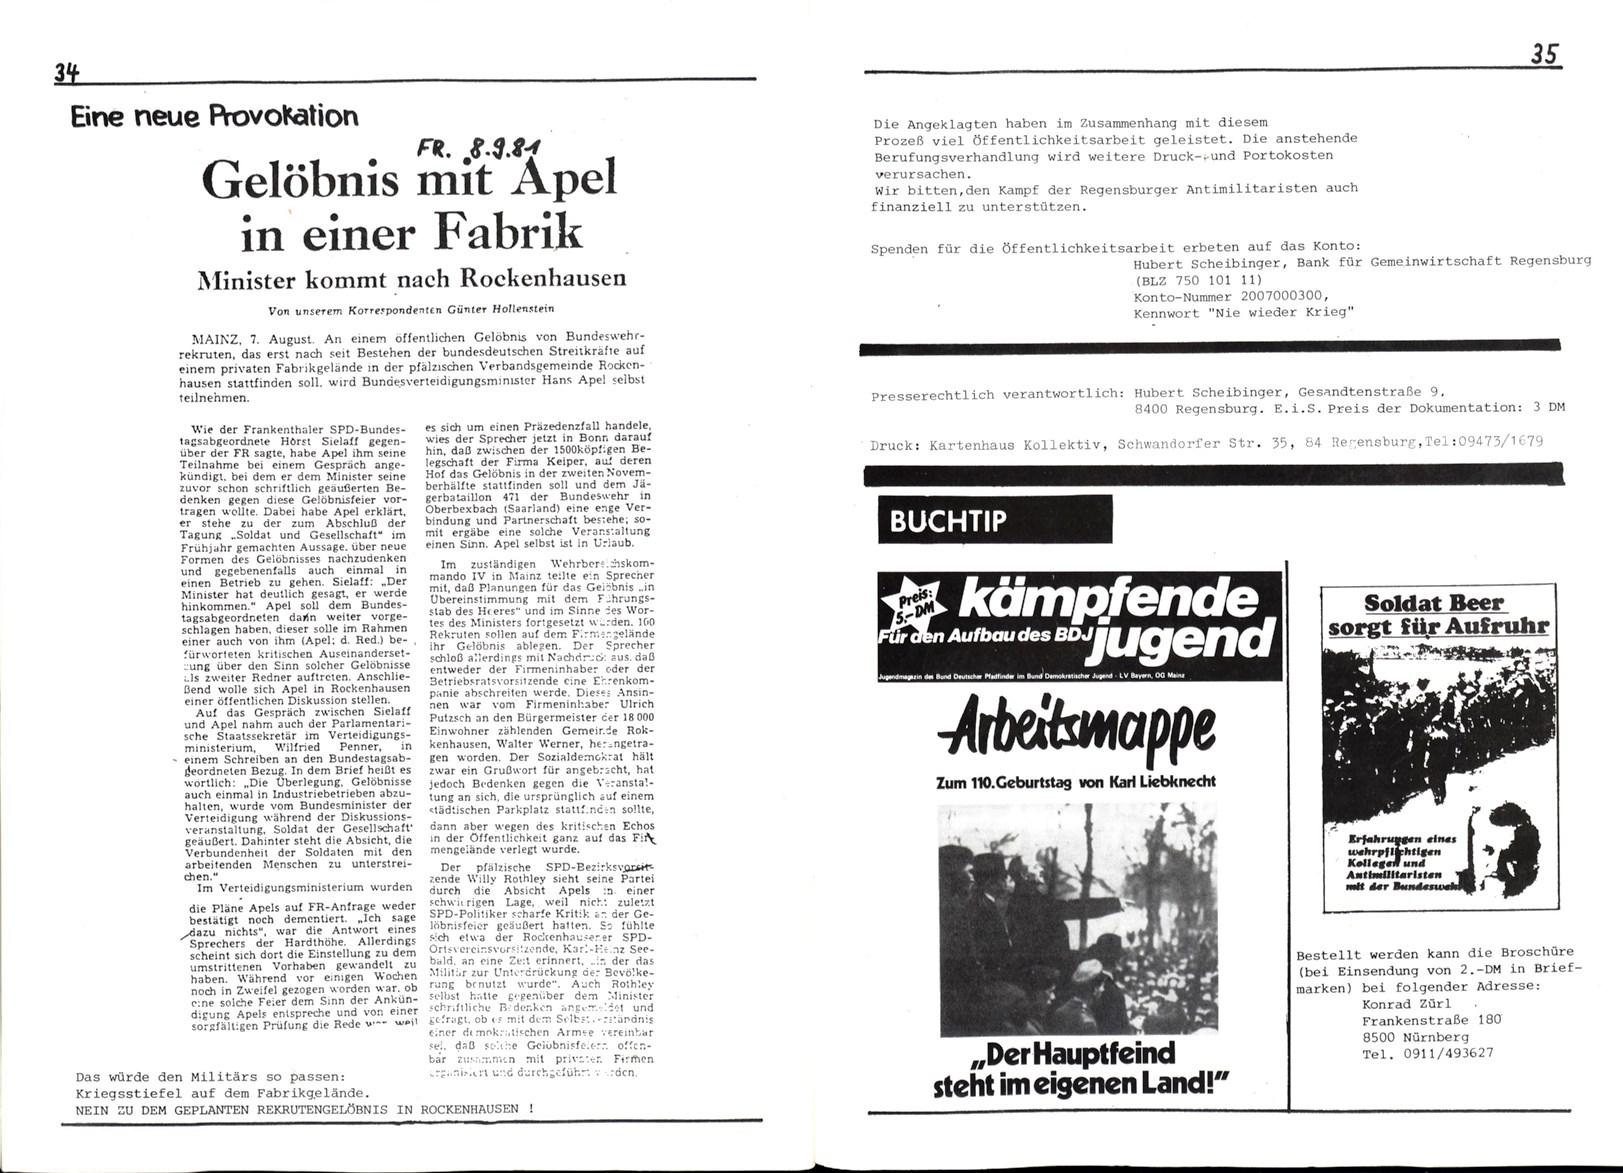 Regensburg_Bundeswehr017